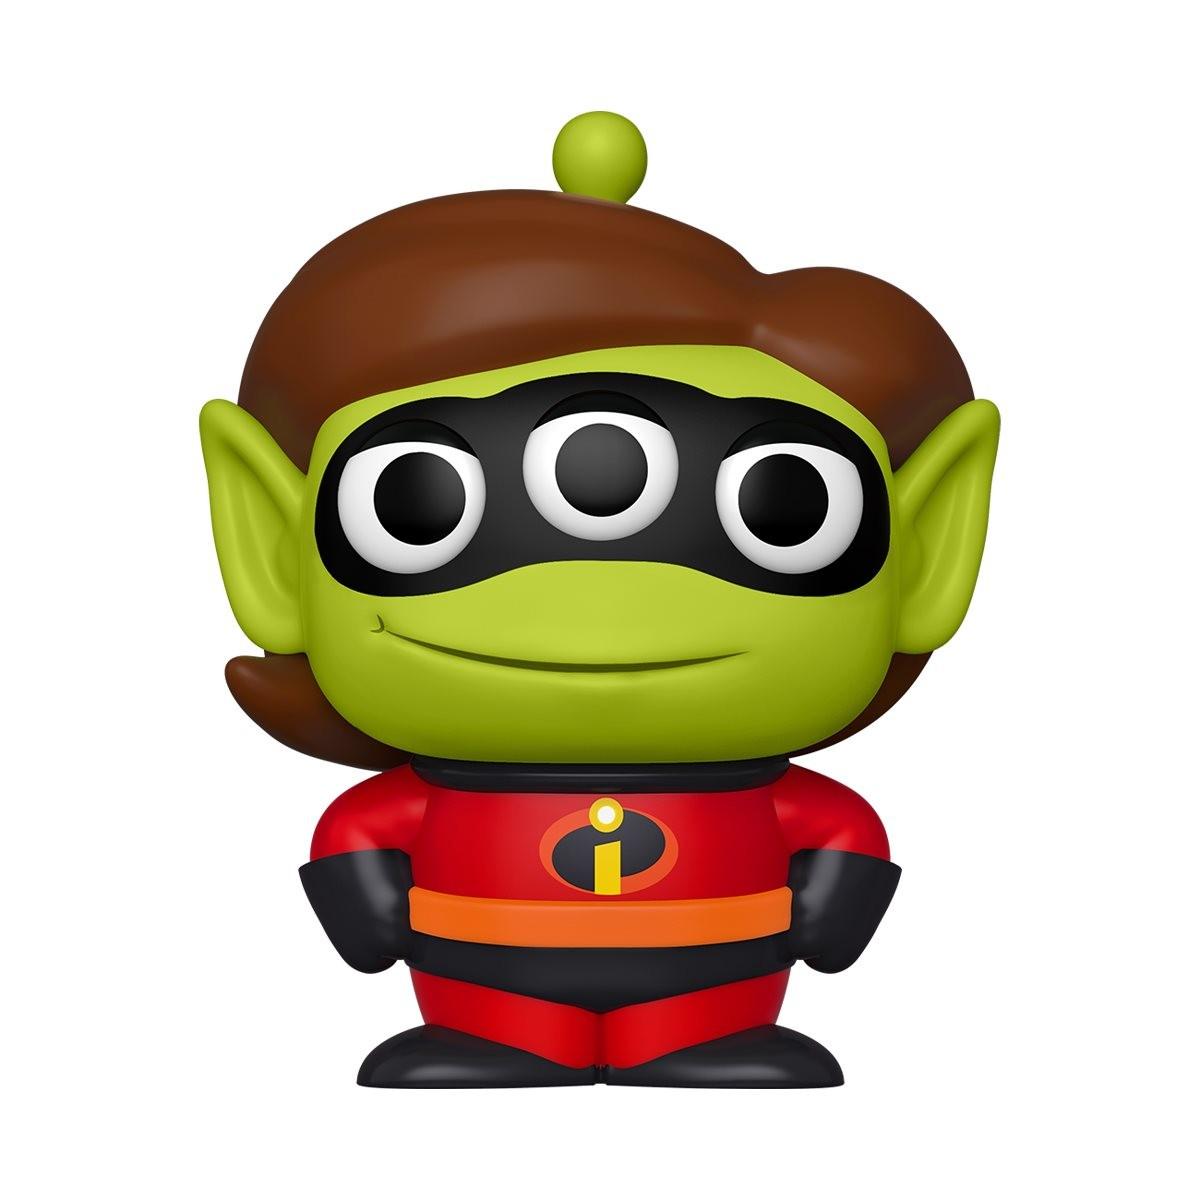 Funko Pop! Disney: Pixar Alien Remix - Alien as Mrs, Incredible #762 - Funko